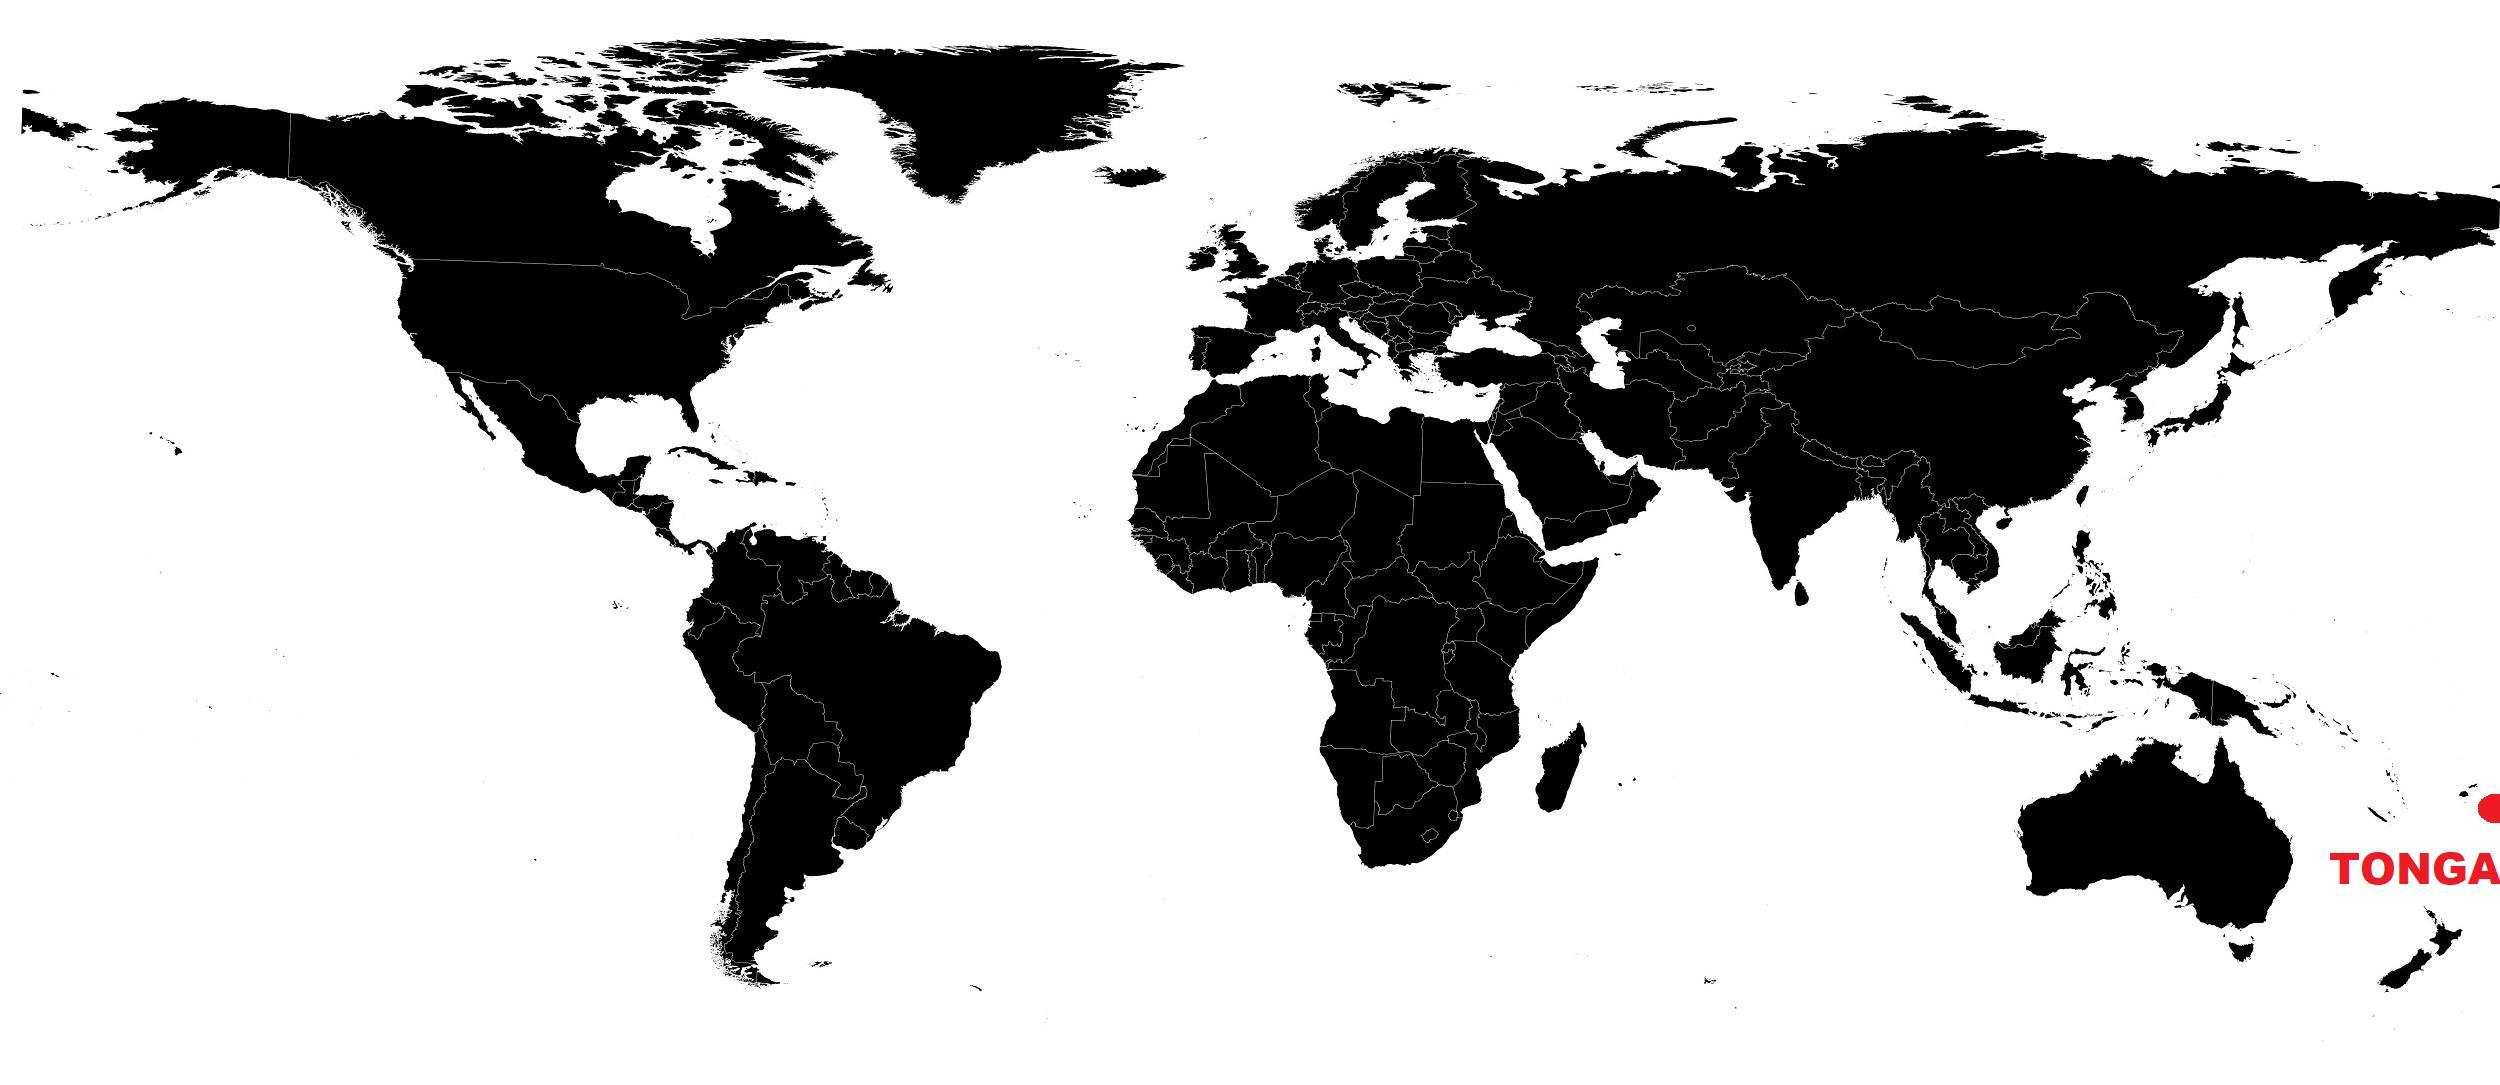 iles tonga carte du monde